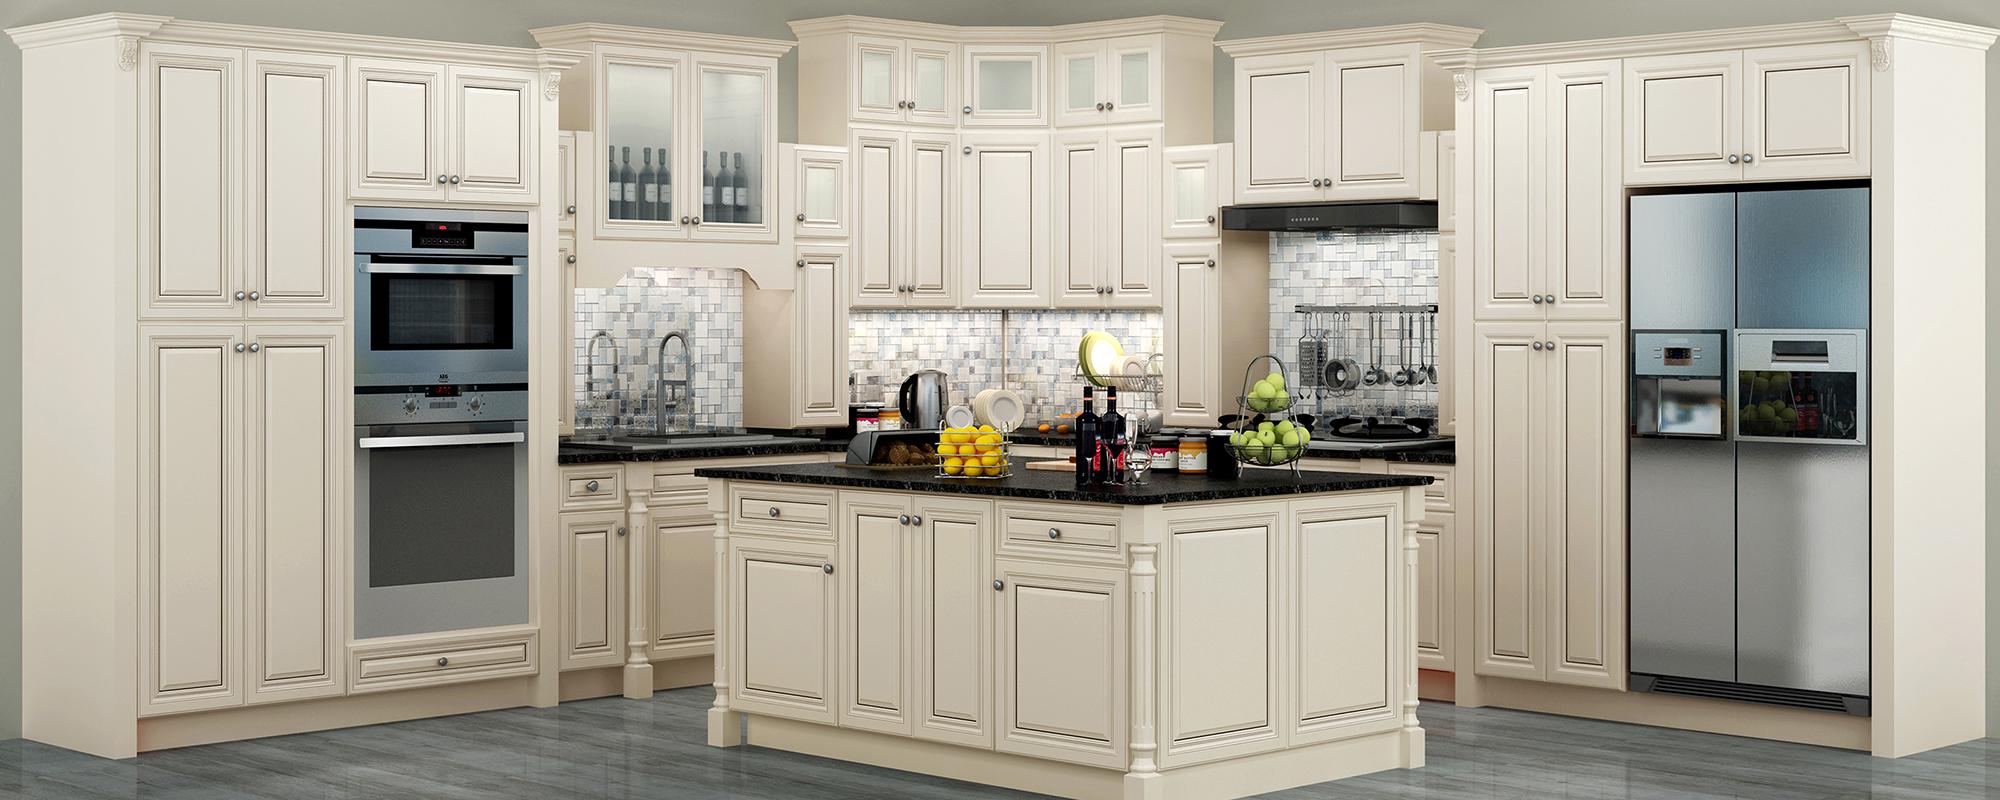 US CABINET – KBDEPOT on kitchen cupboards, kitchen cabinets product, kitchen flooring, kitchen countertops,